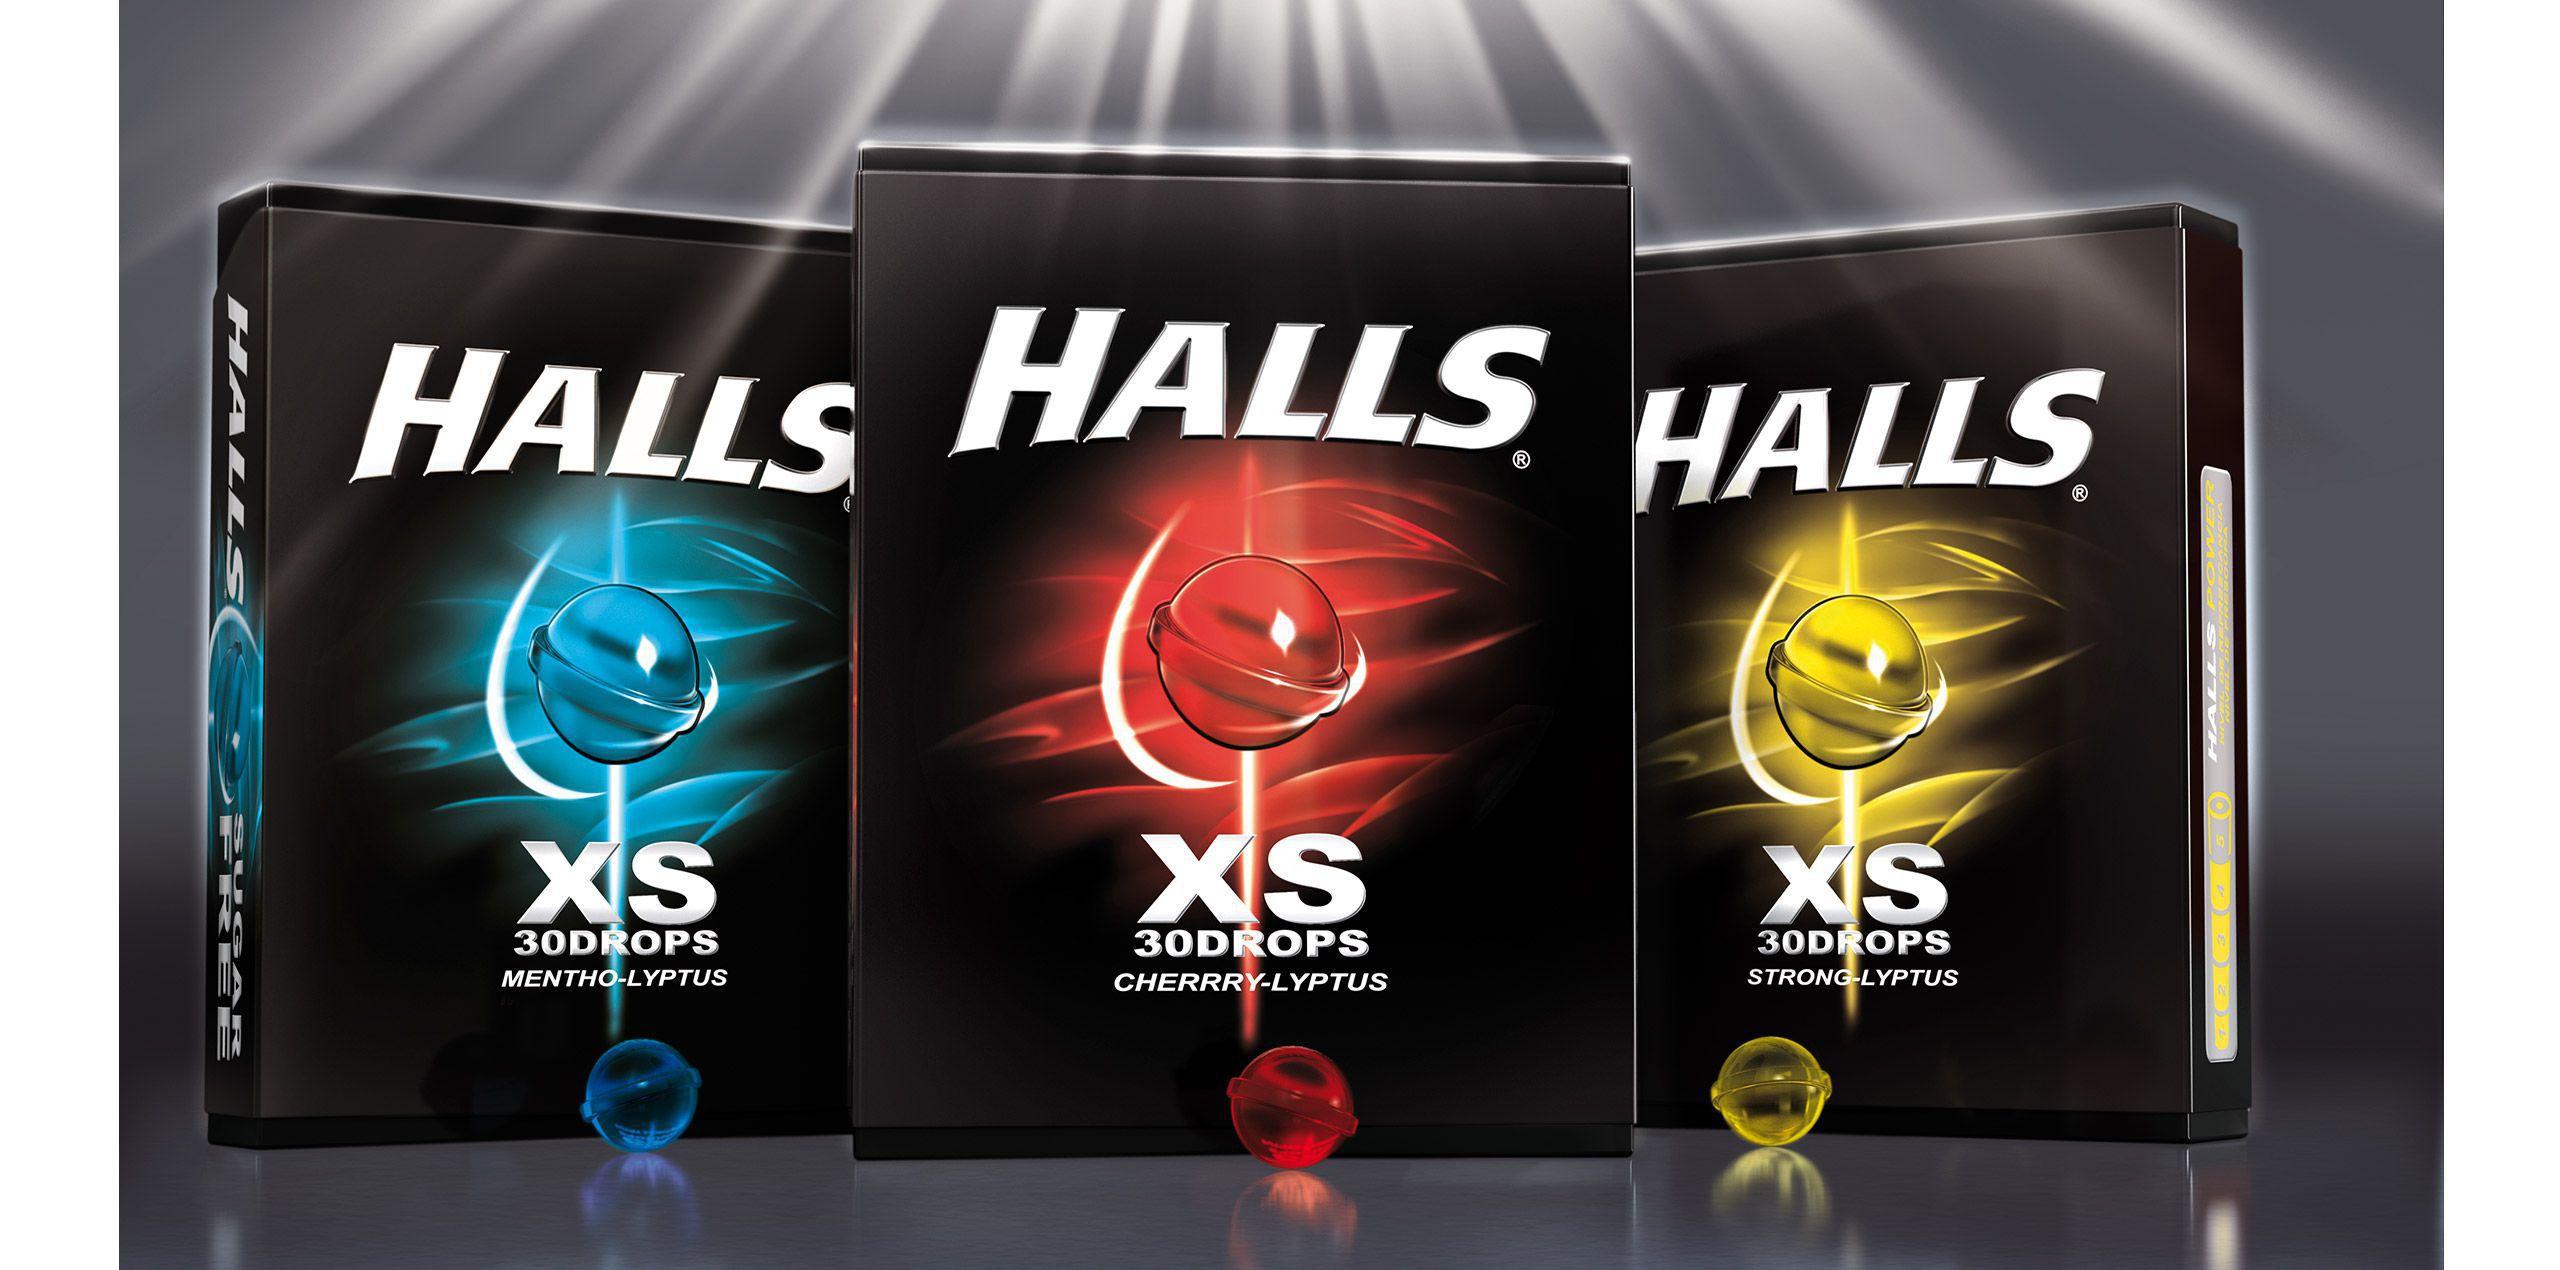 Halls Hd Desktop